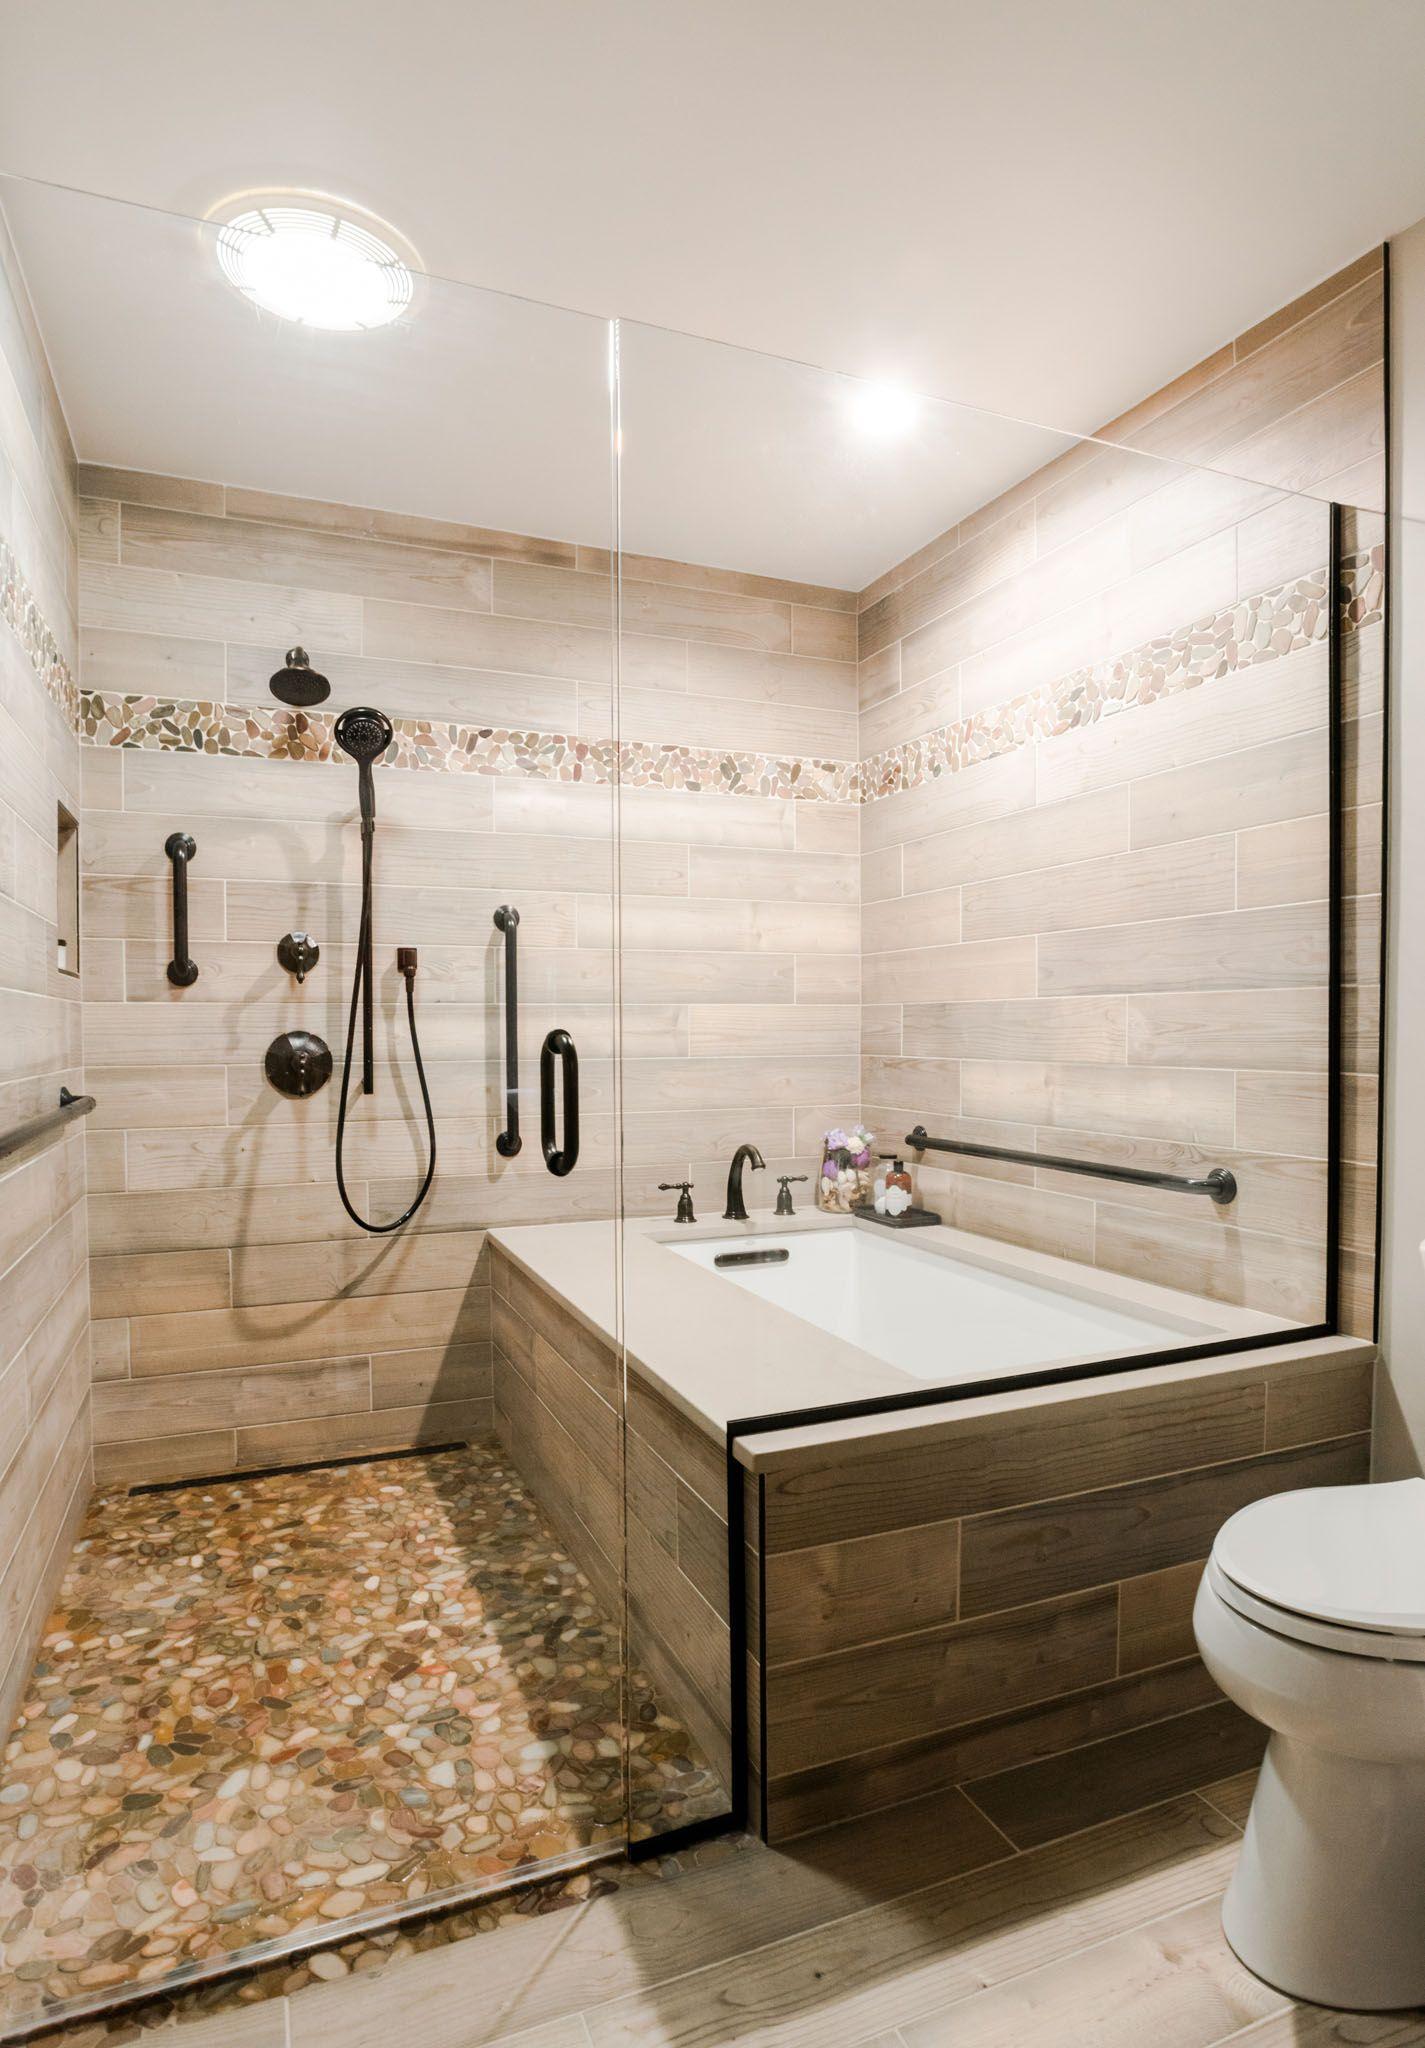 Voted Baltimore's Best Roofing & Remodeling Company  Corner Tub Impressive Bathroom Remodeling Baltimore Decorating Inspiration